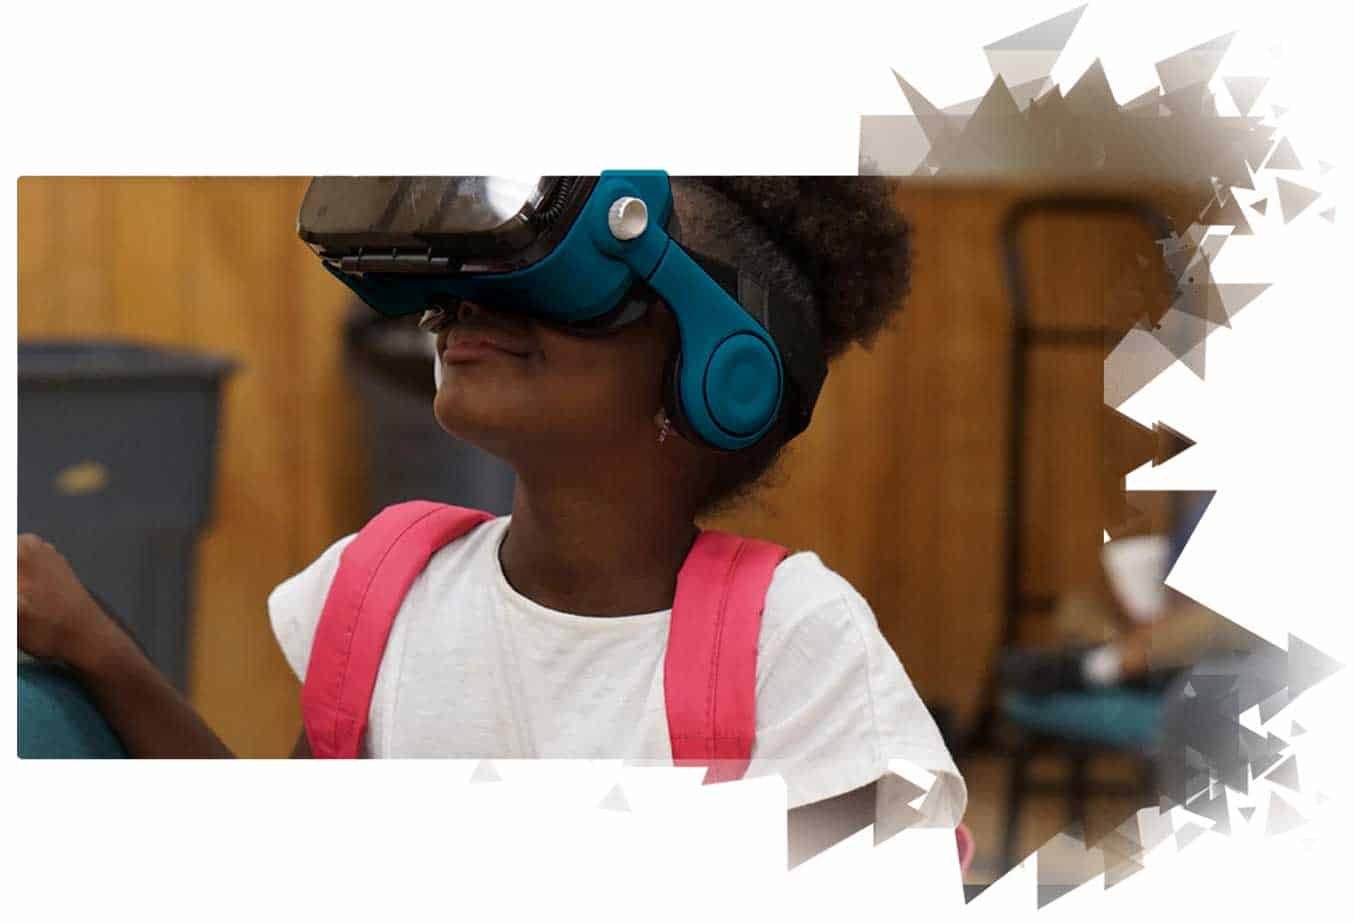 Virtual reality education image